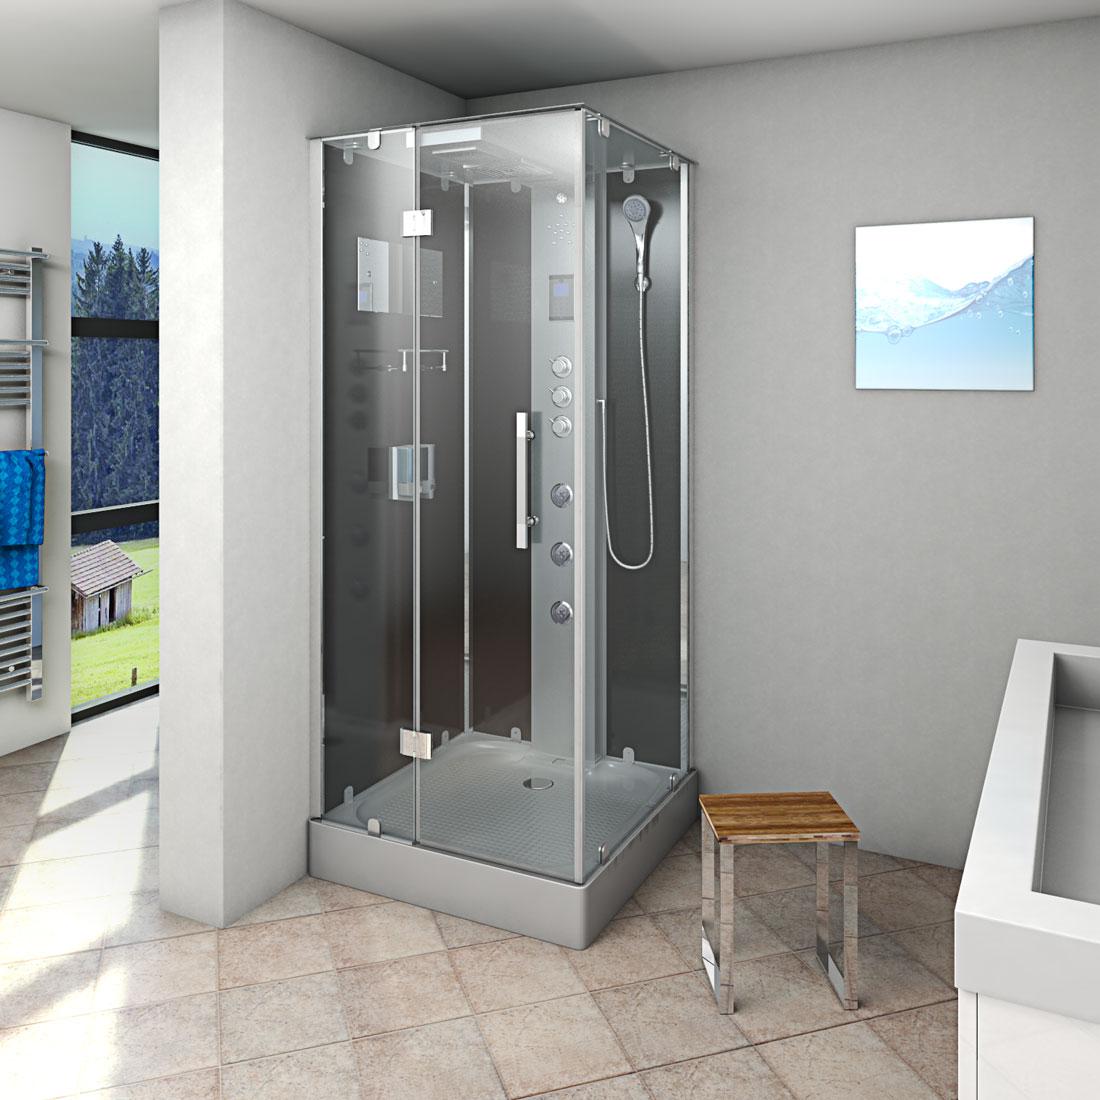 acquavapore dtp6038 3301l dusche duschtempel komplett duschkabine th 90x90 ebay. Black Bedroom Furniture Sets. Home Design Ideas